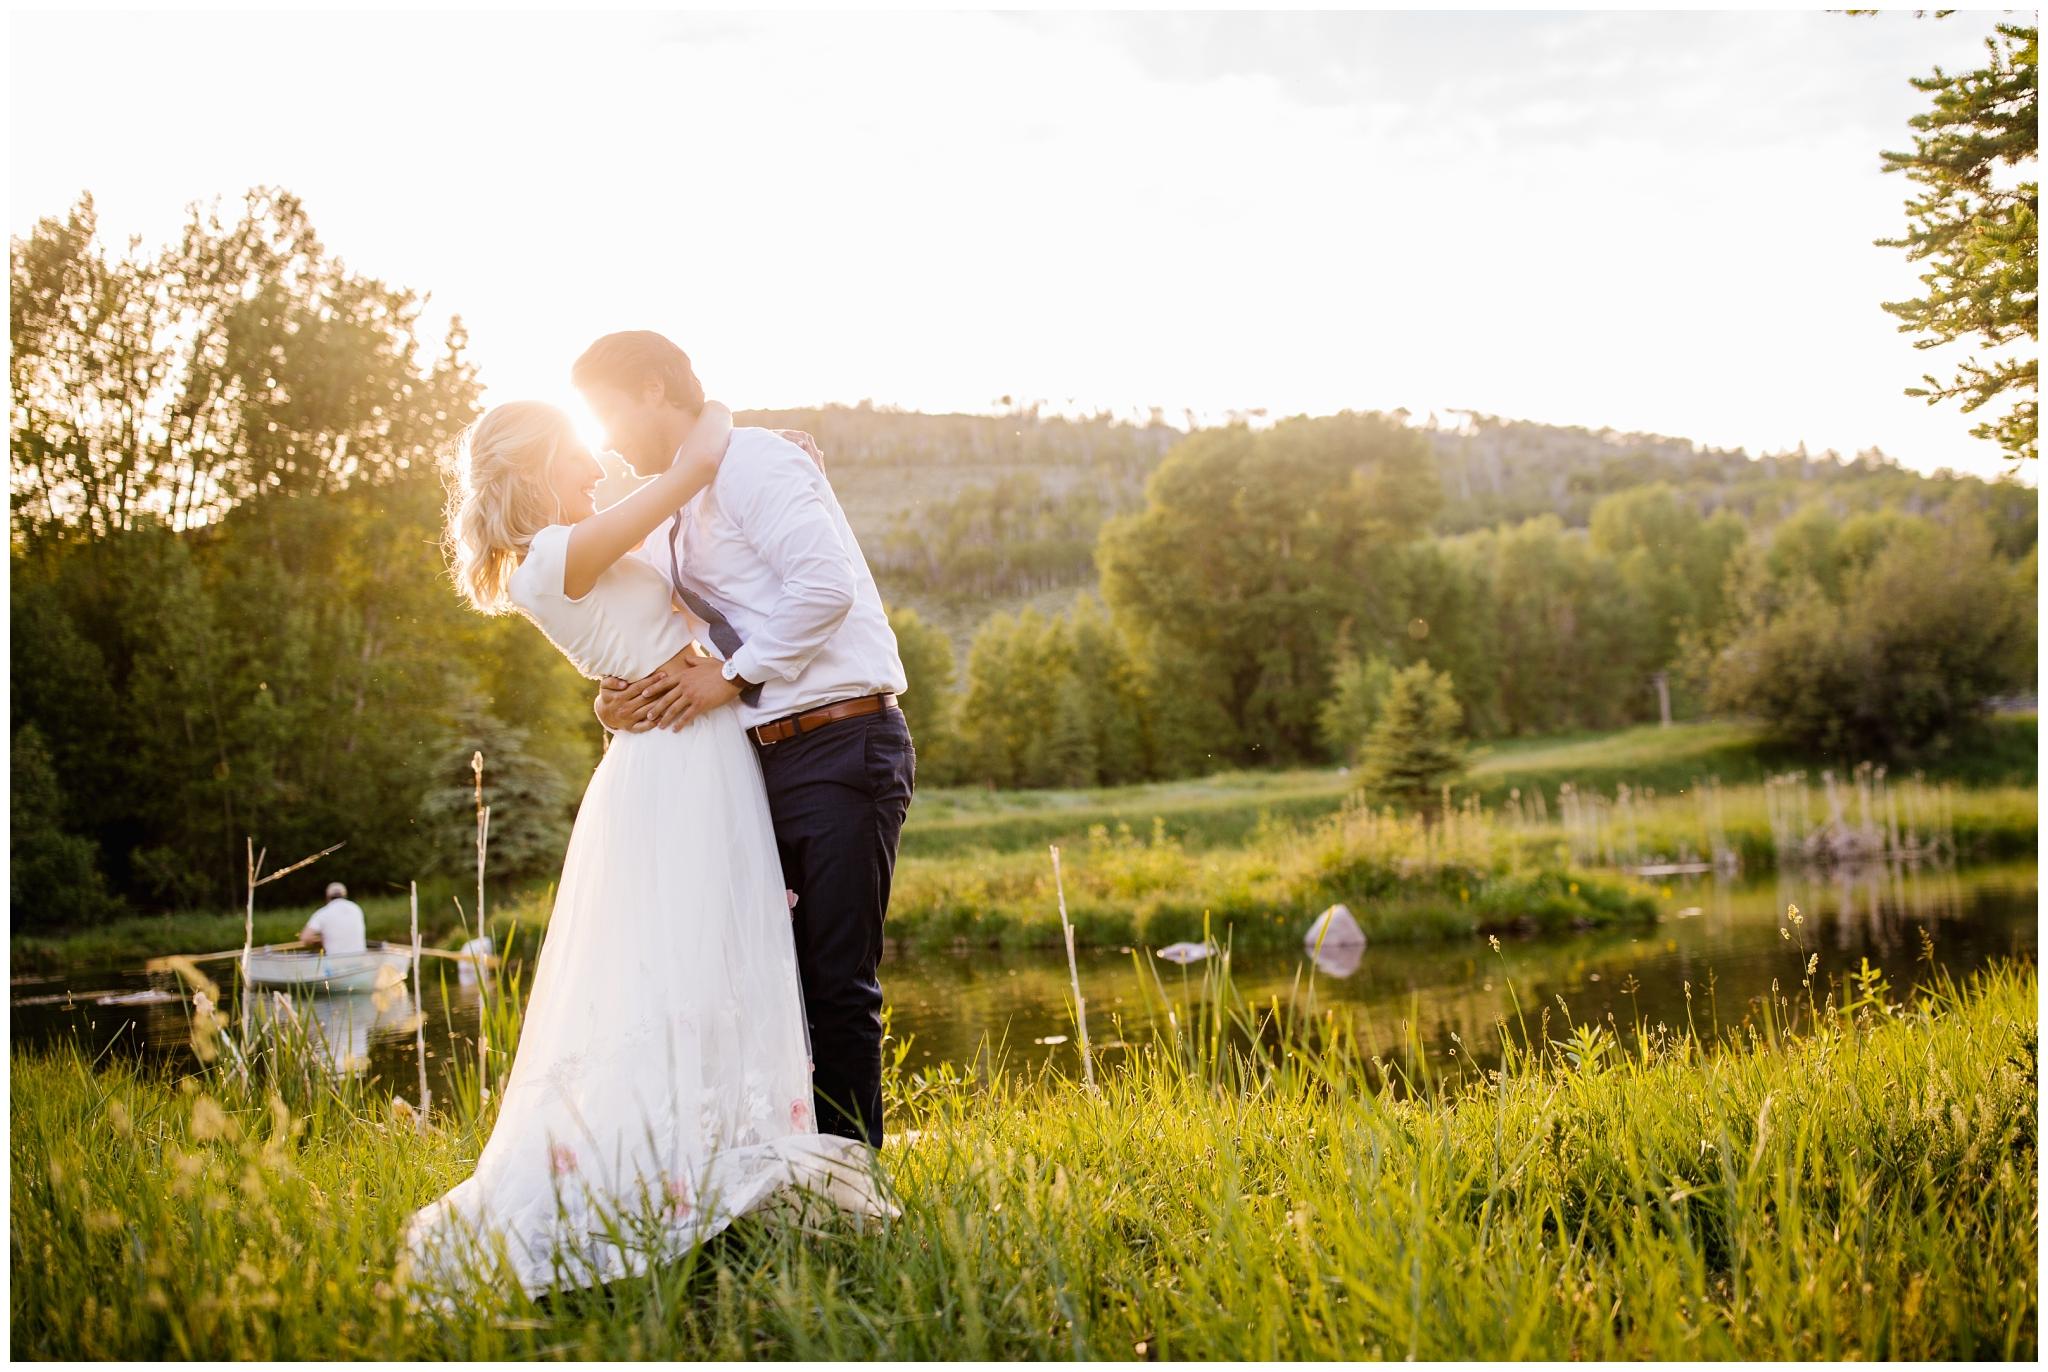 Lizzie-B-Imagery-Utah-Wedding-Photographer-Park-City-Photographer_0057.jpg